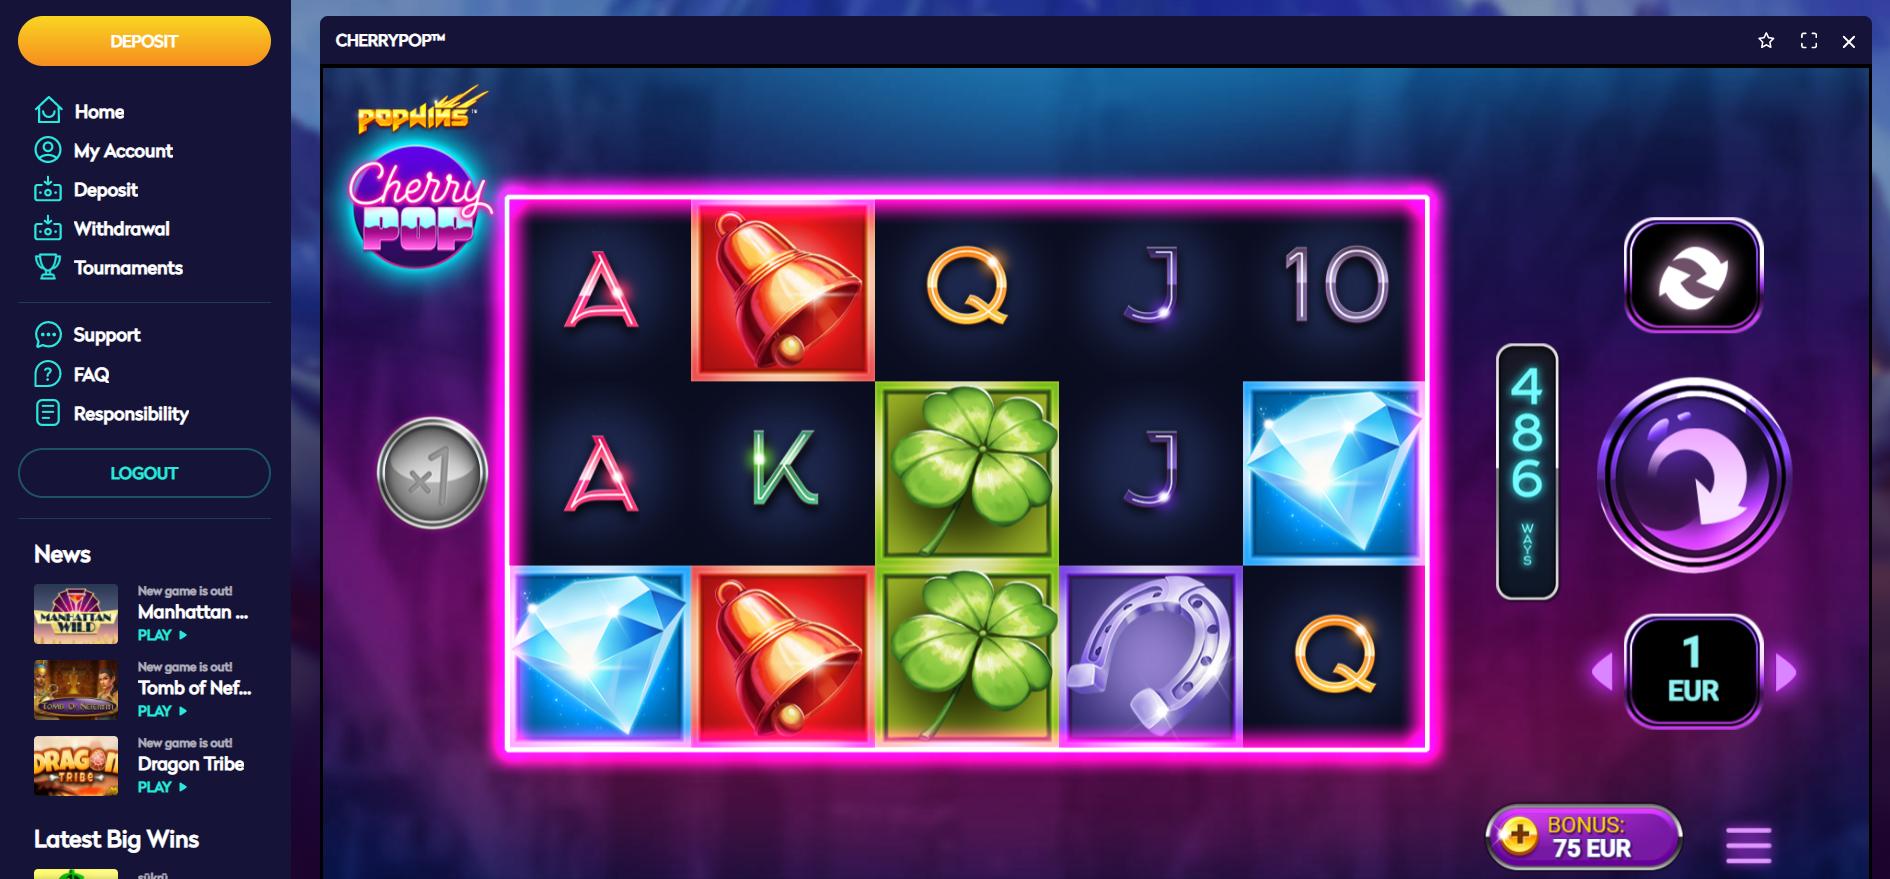 casino360 cherry pop avatar ux yggdrasil